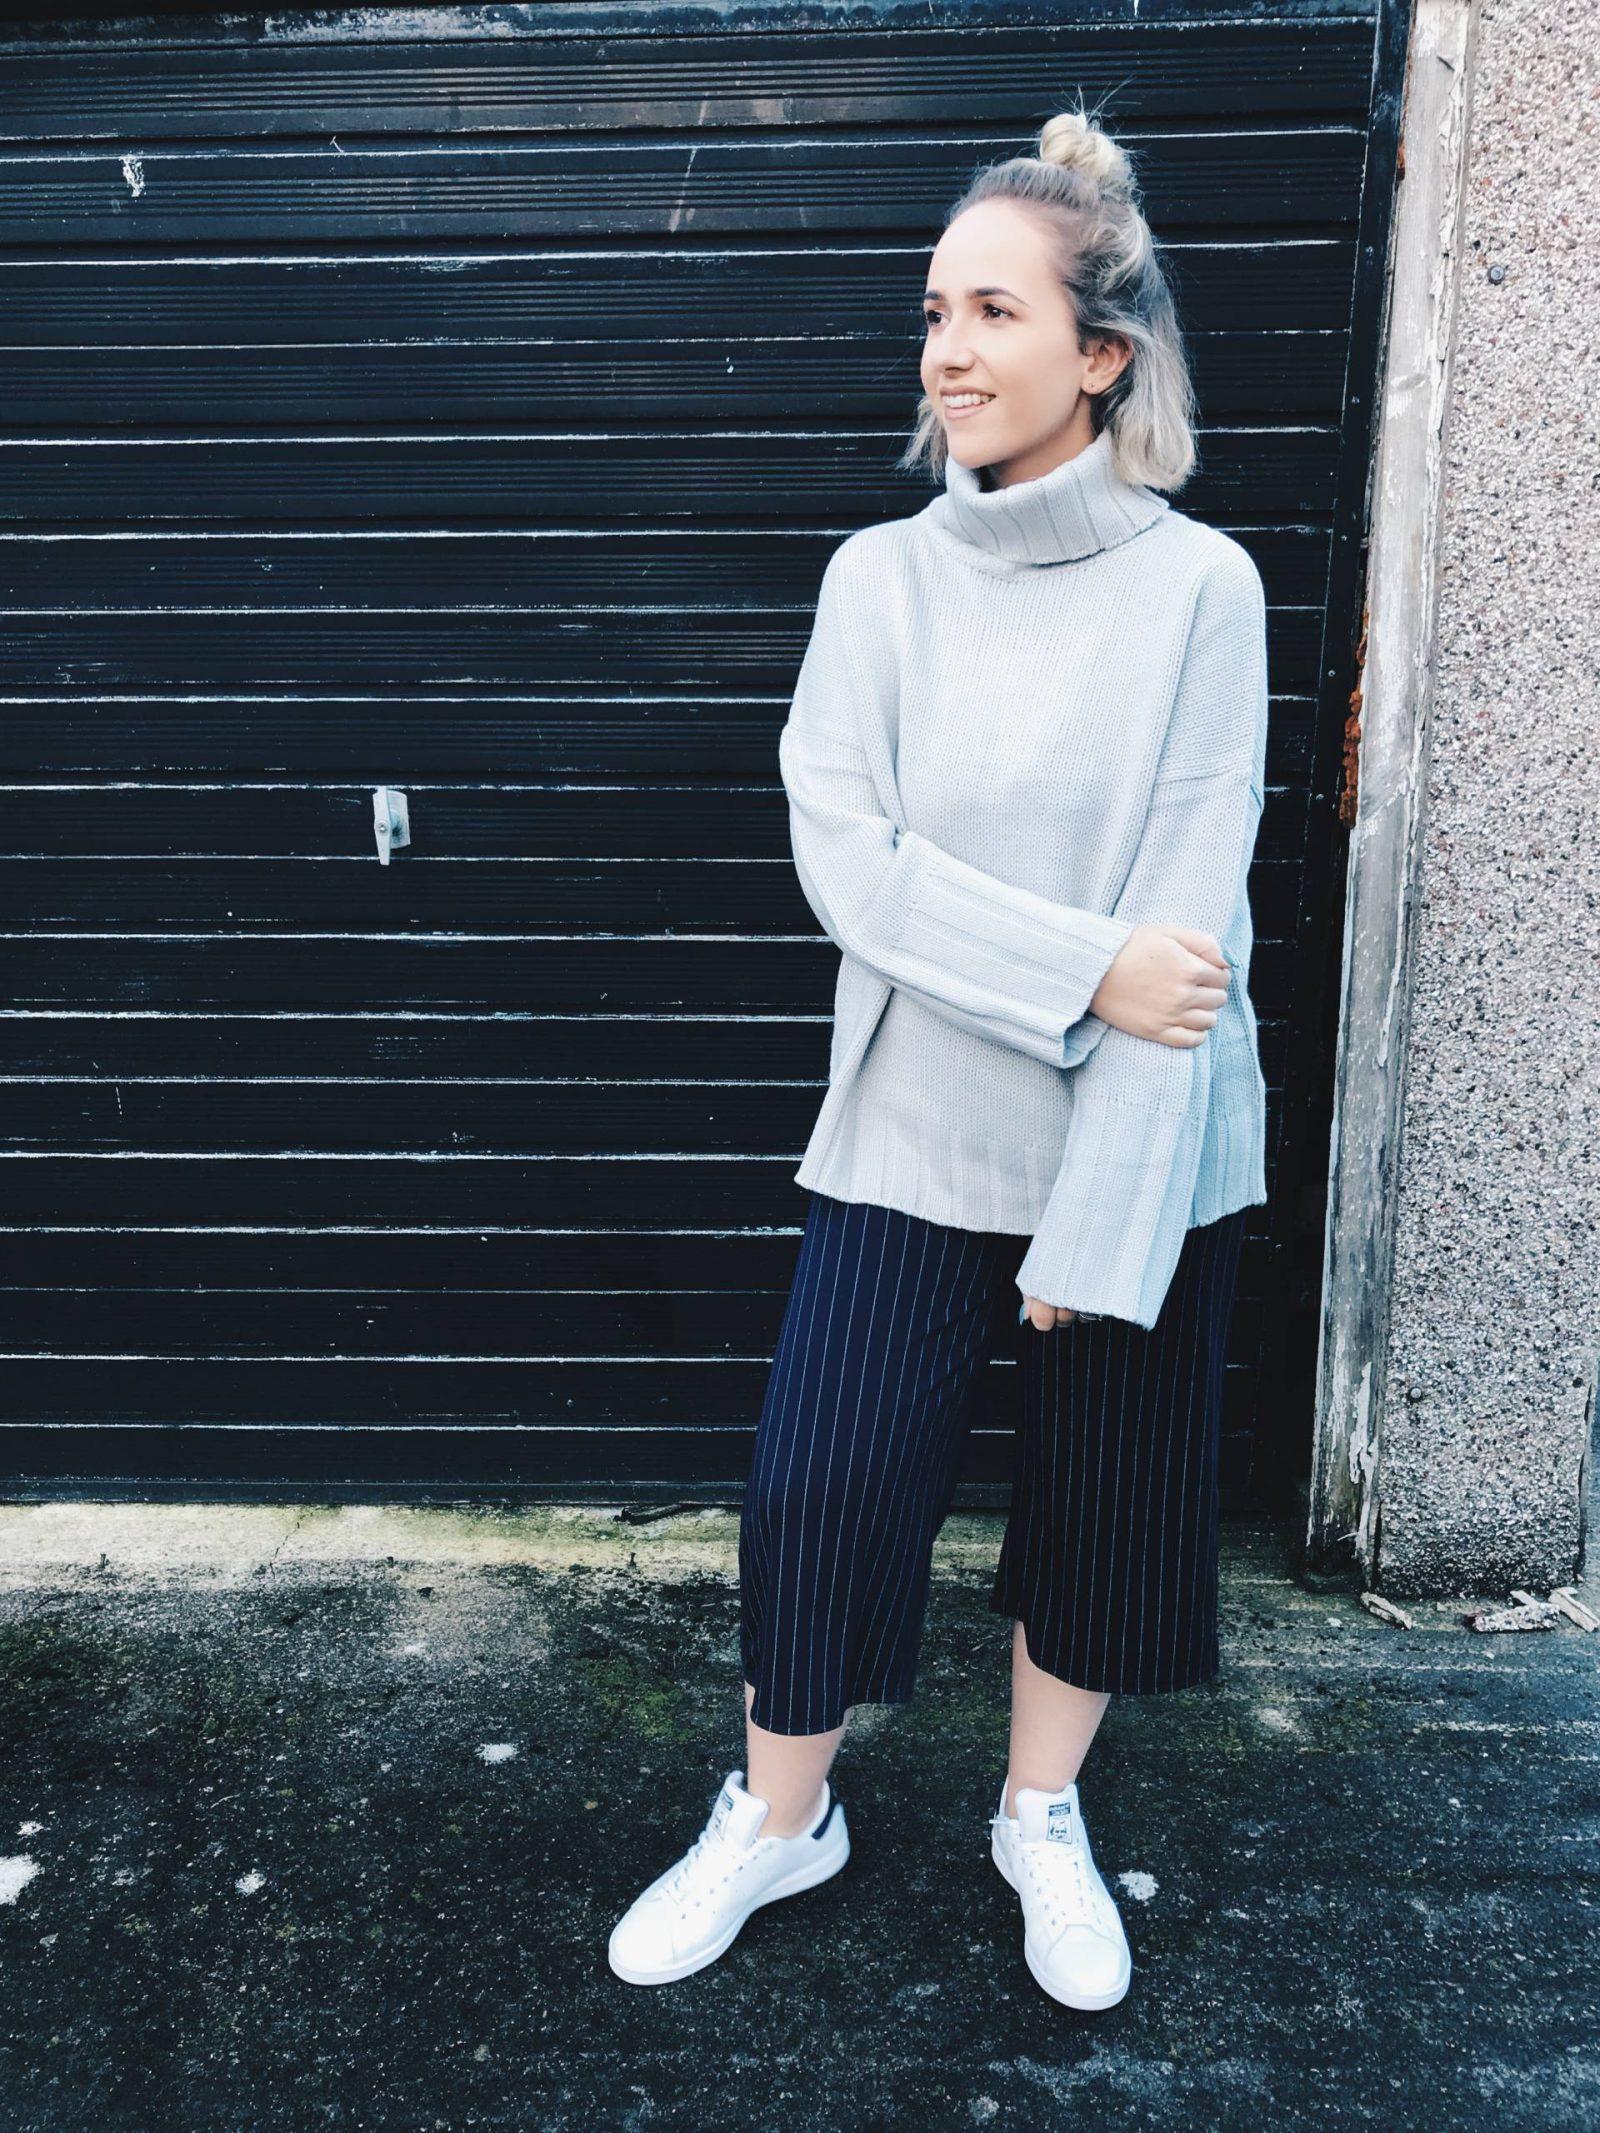 Amy Farquhar Boohoo Blogger Shop Autumn Style